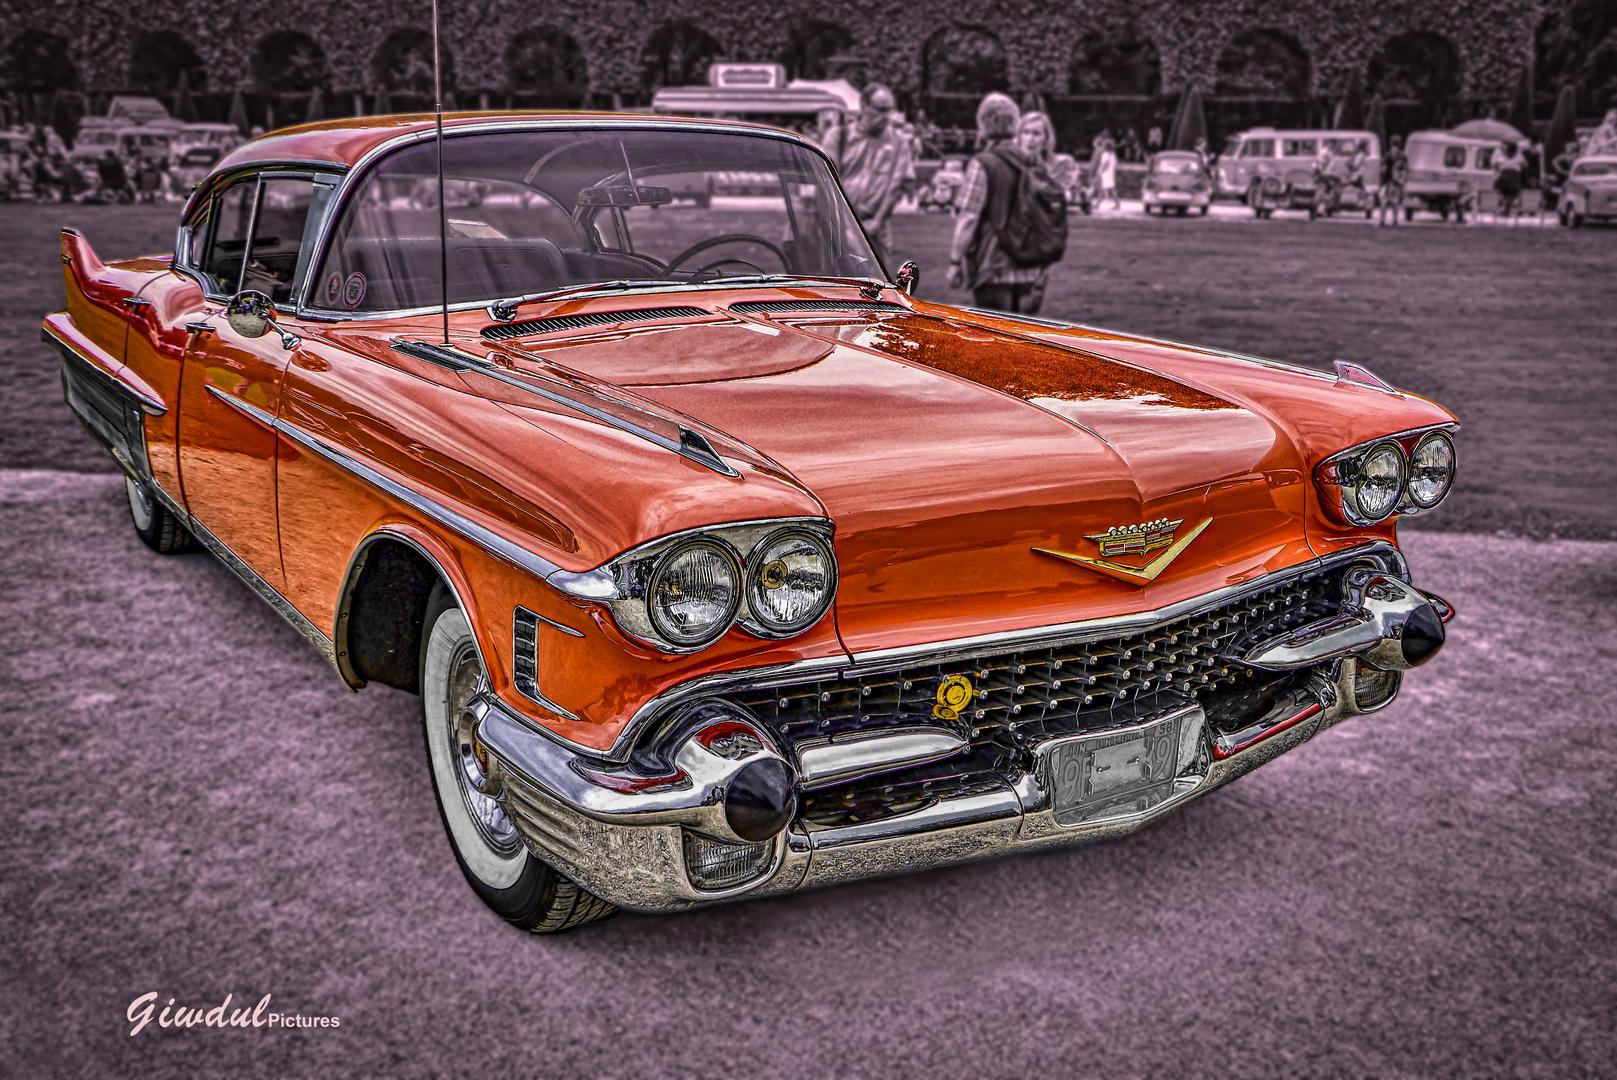 Cadillac Fleetwood Sixty Special (BJ 1958)